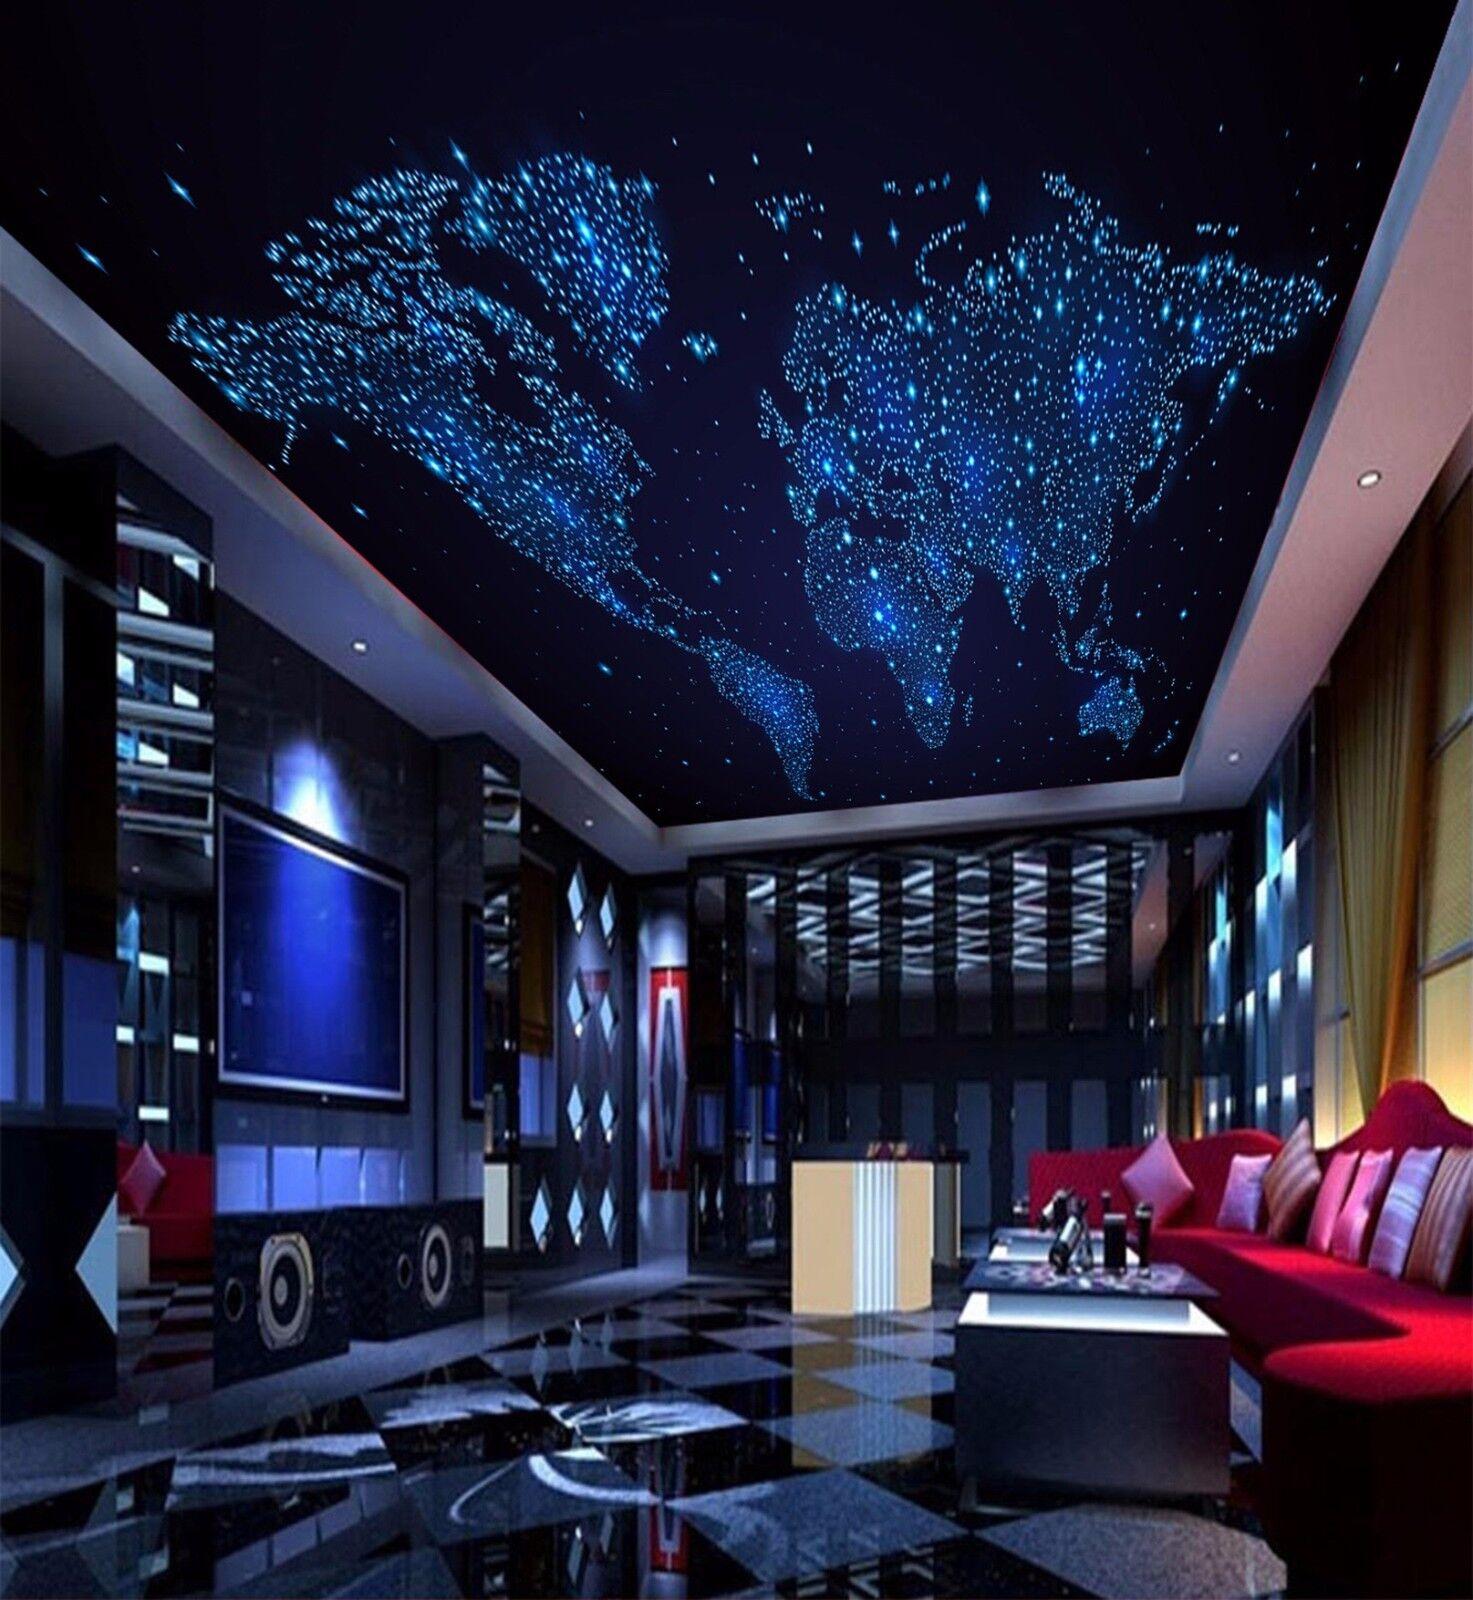 3D Stas Map Ceiling WallPaper Murals Wall Print Decal Deco AJ WALLPAPER AU